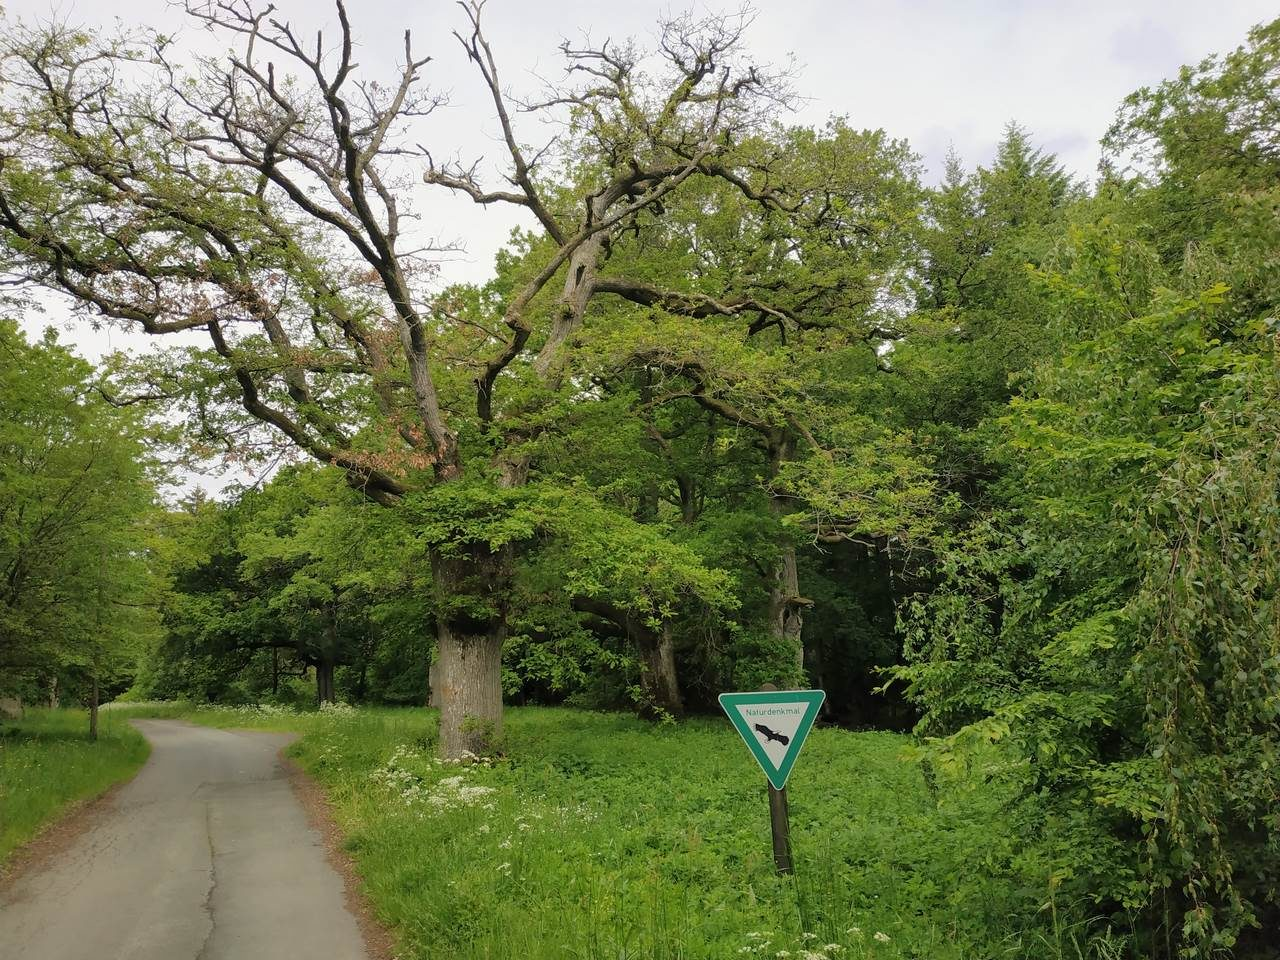 post_touren_waeller_tour_greifensteinschleife_8-1280-960.jpg